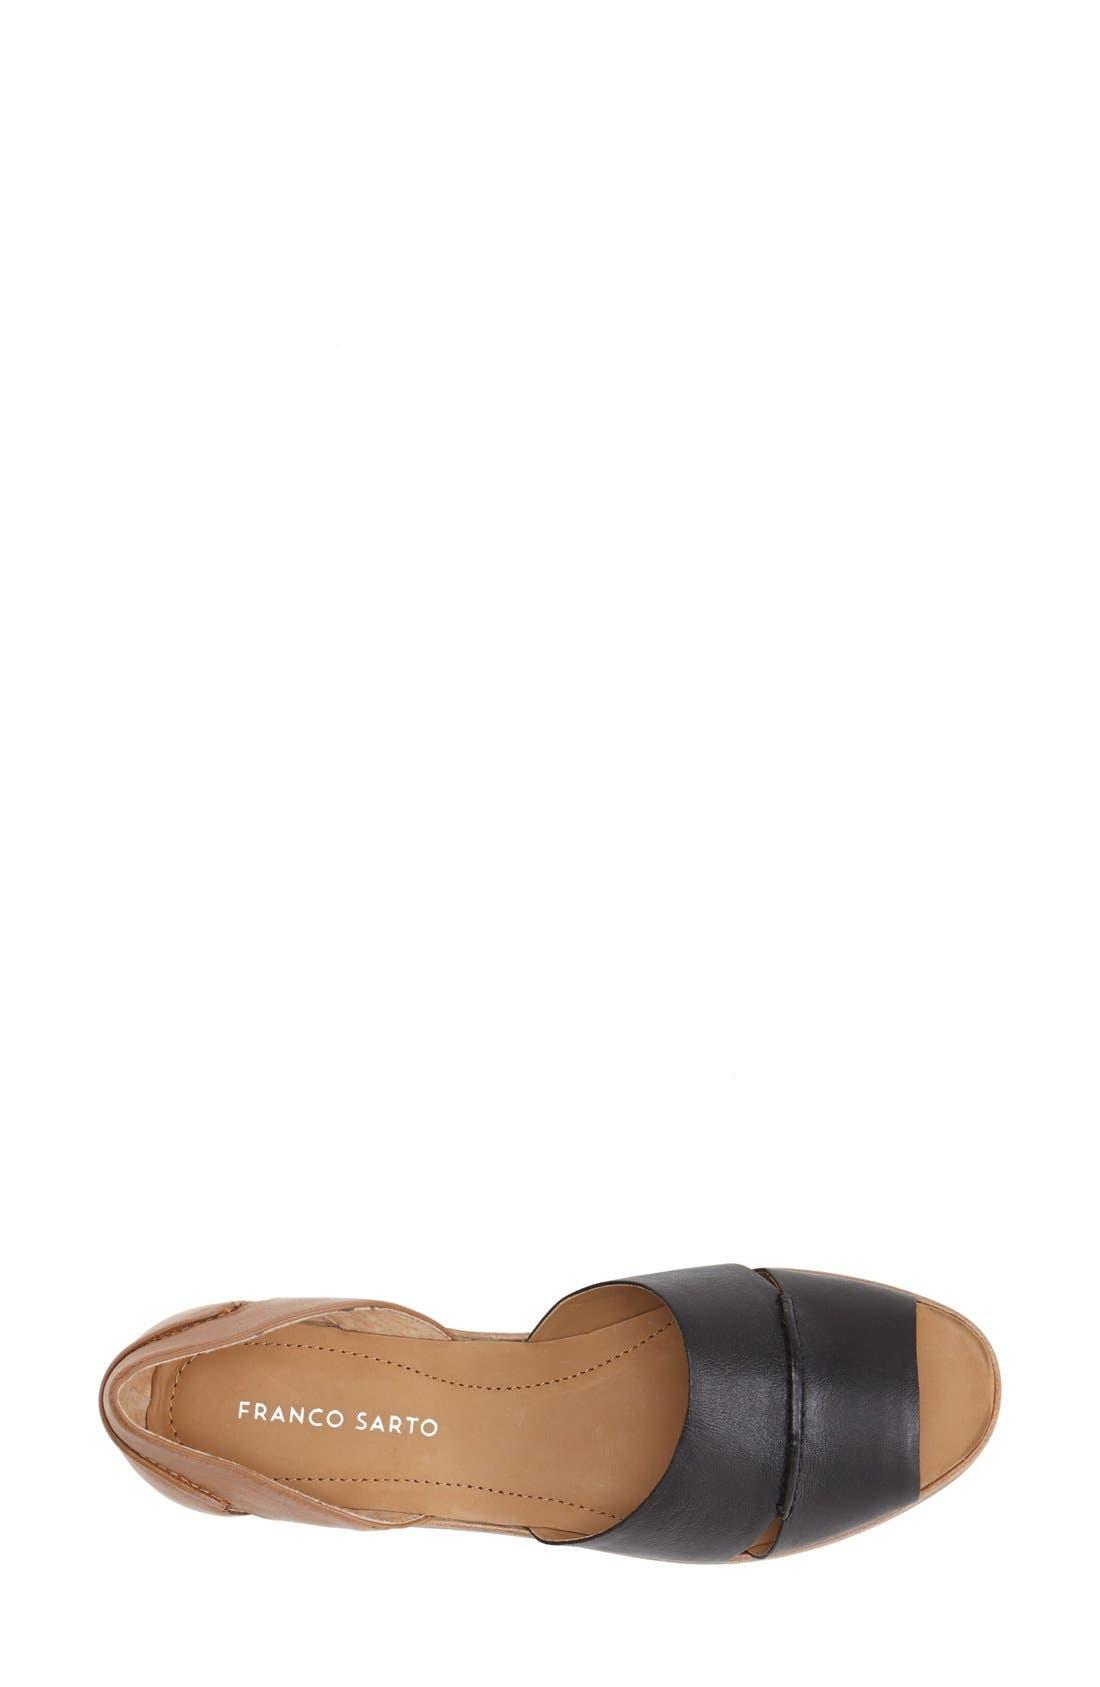 FRANCO SARTO, 'Vivace' Leather d'Orsay Flat, Alternate thumbnail 3, color, 002